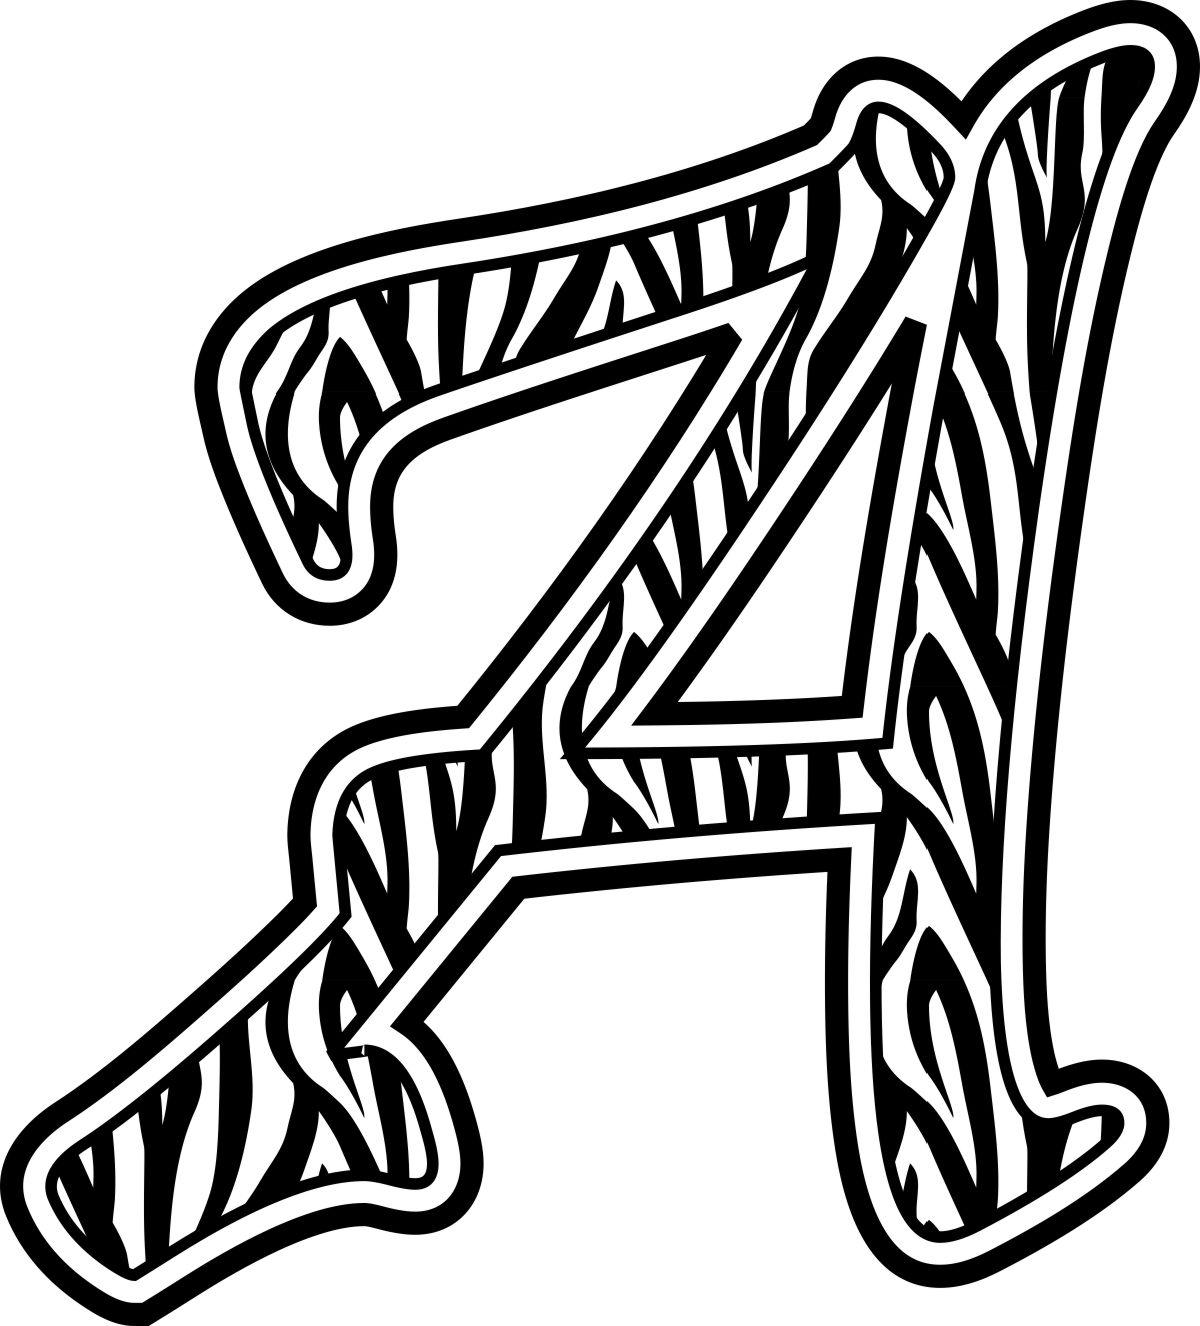 Free Printable Pencil Drawings Of Zebras - Clipart Best - Cliparts.co - Free Printable Pencil Drawings